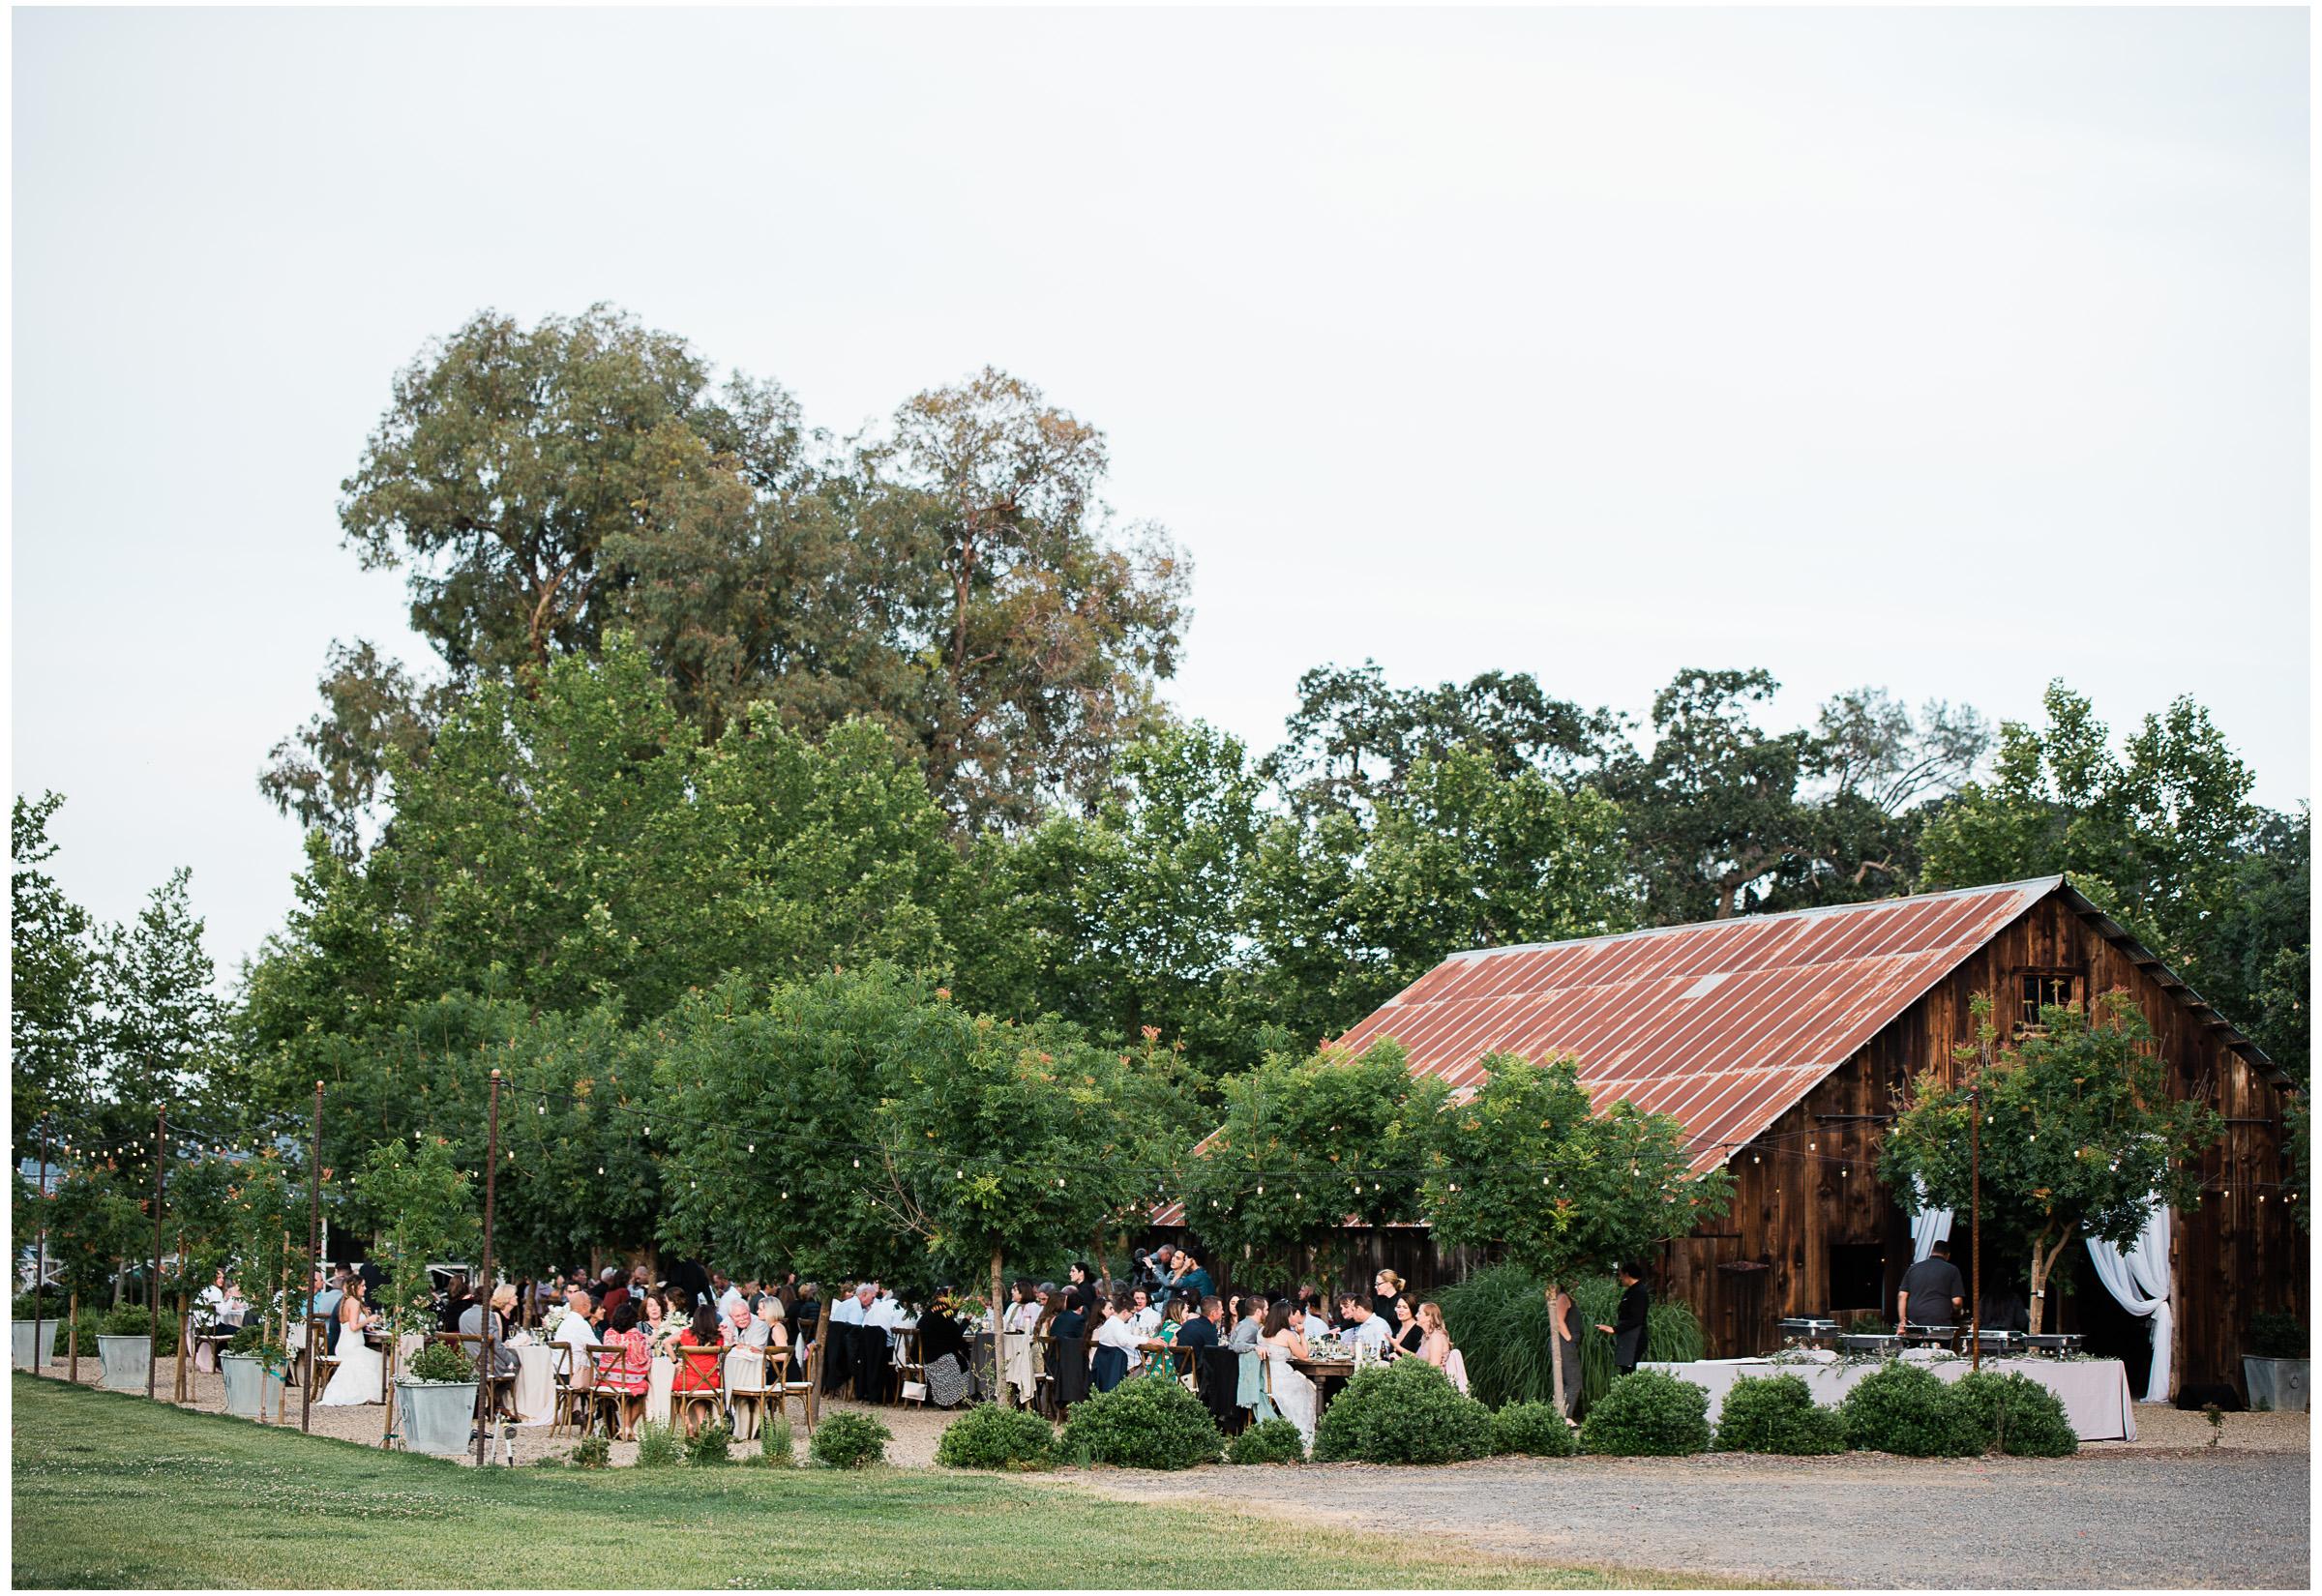 Winters Wedding - Sacramento Photographer - Field & Pond - Justin Wilcox Photography - 30.jpg